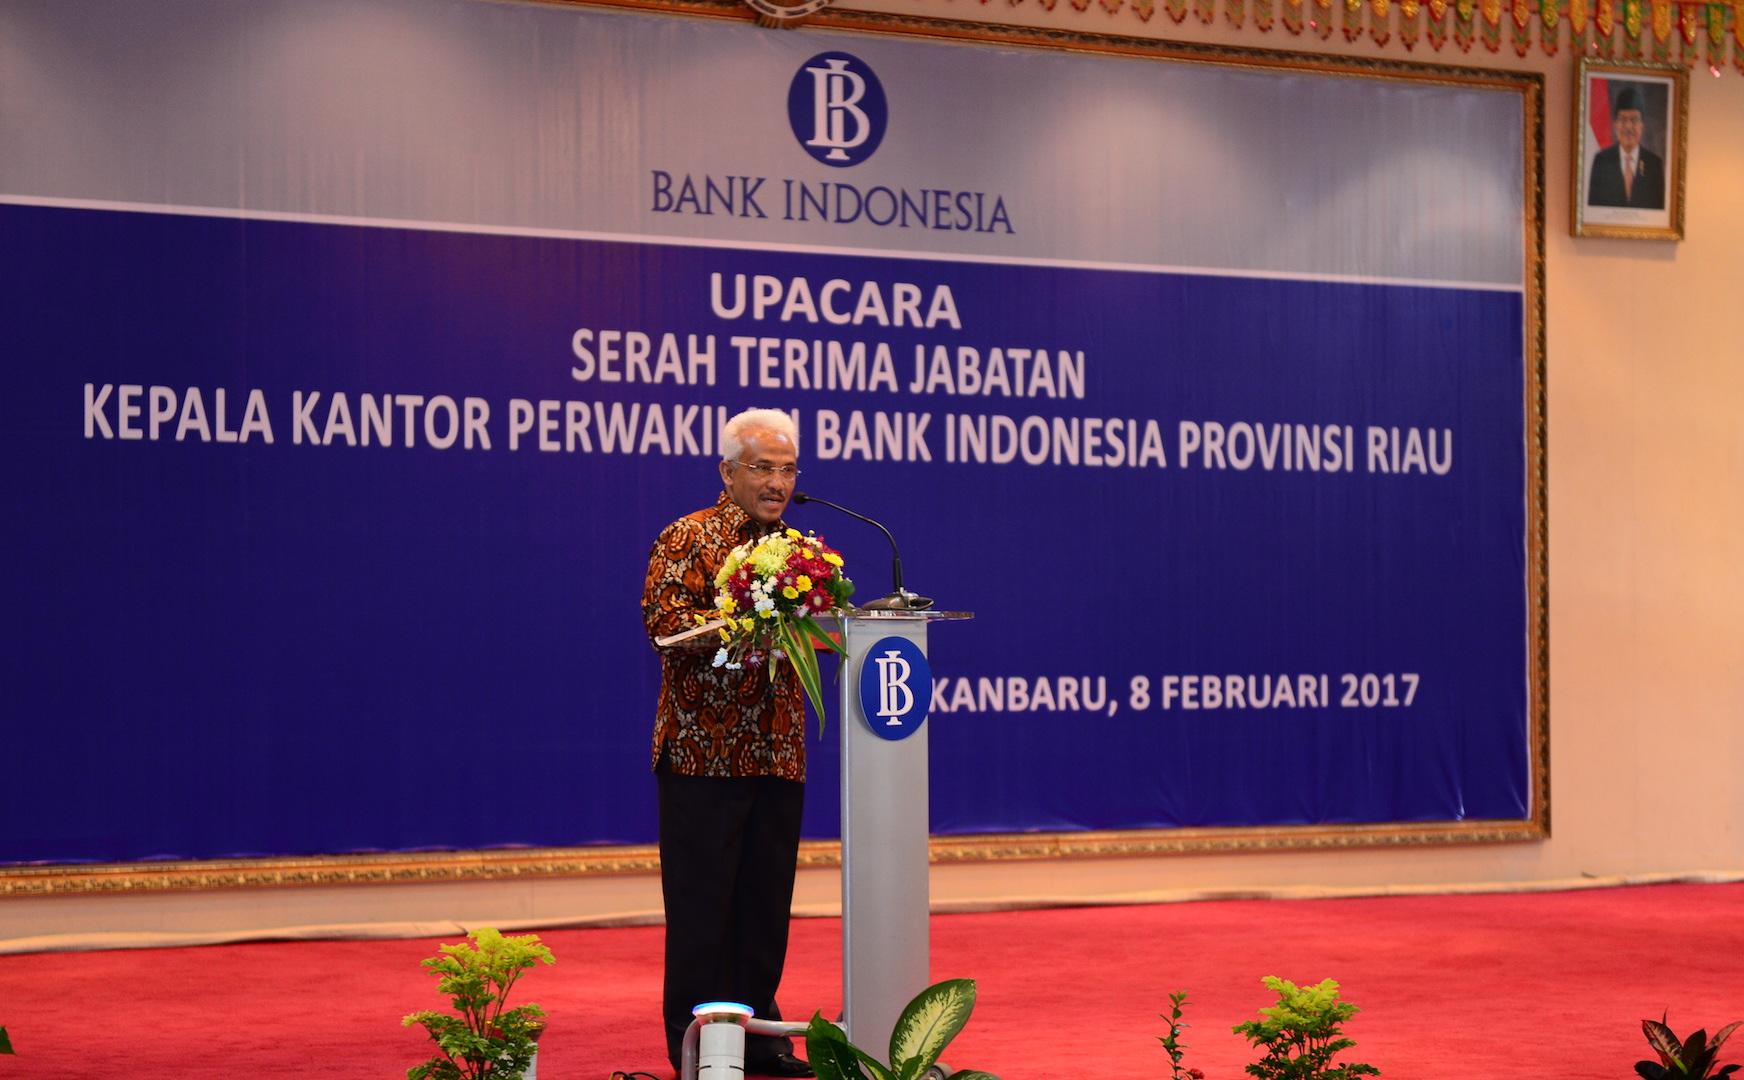 Permalink ke Sertijab Kepala Kantor Perwakilan Bank Indonesia Provinsi Riau